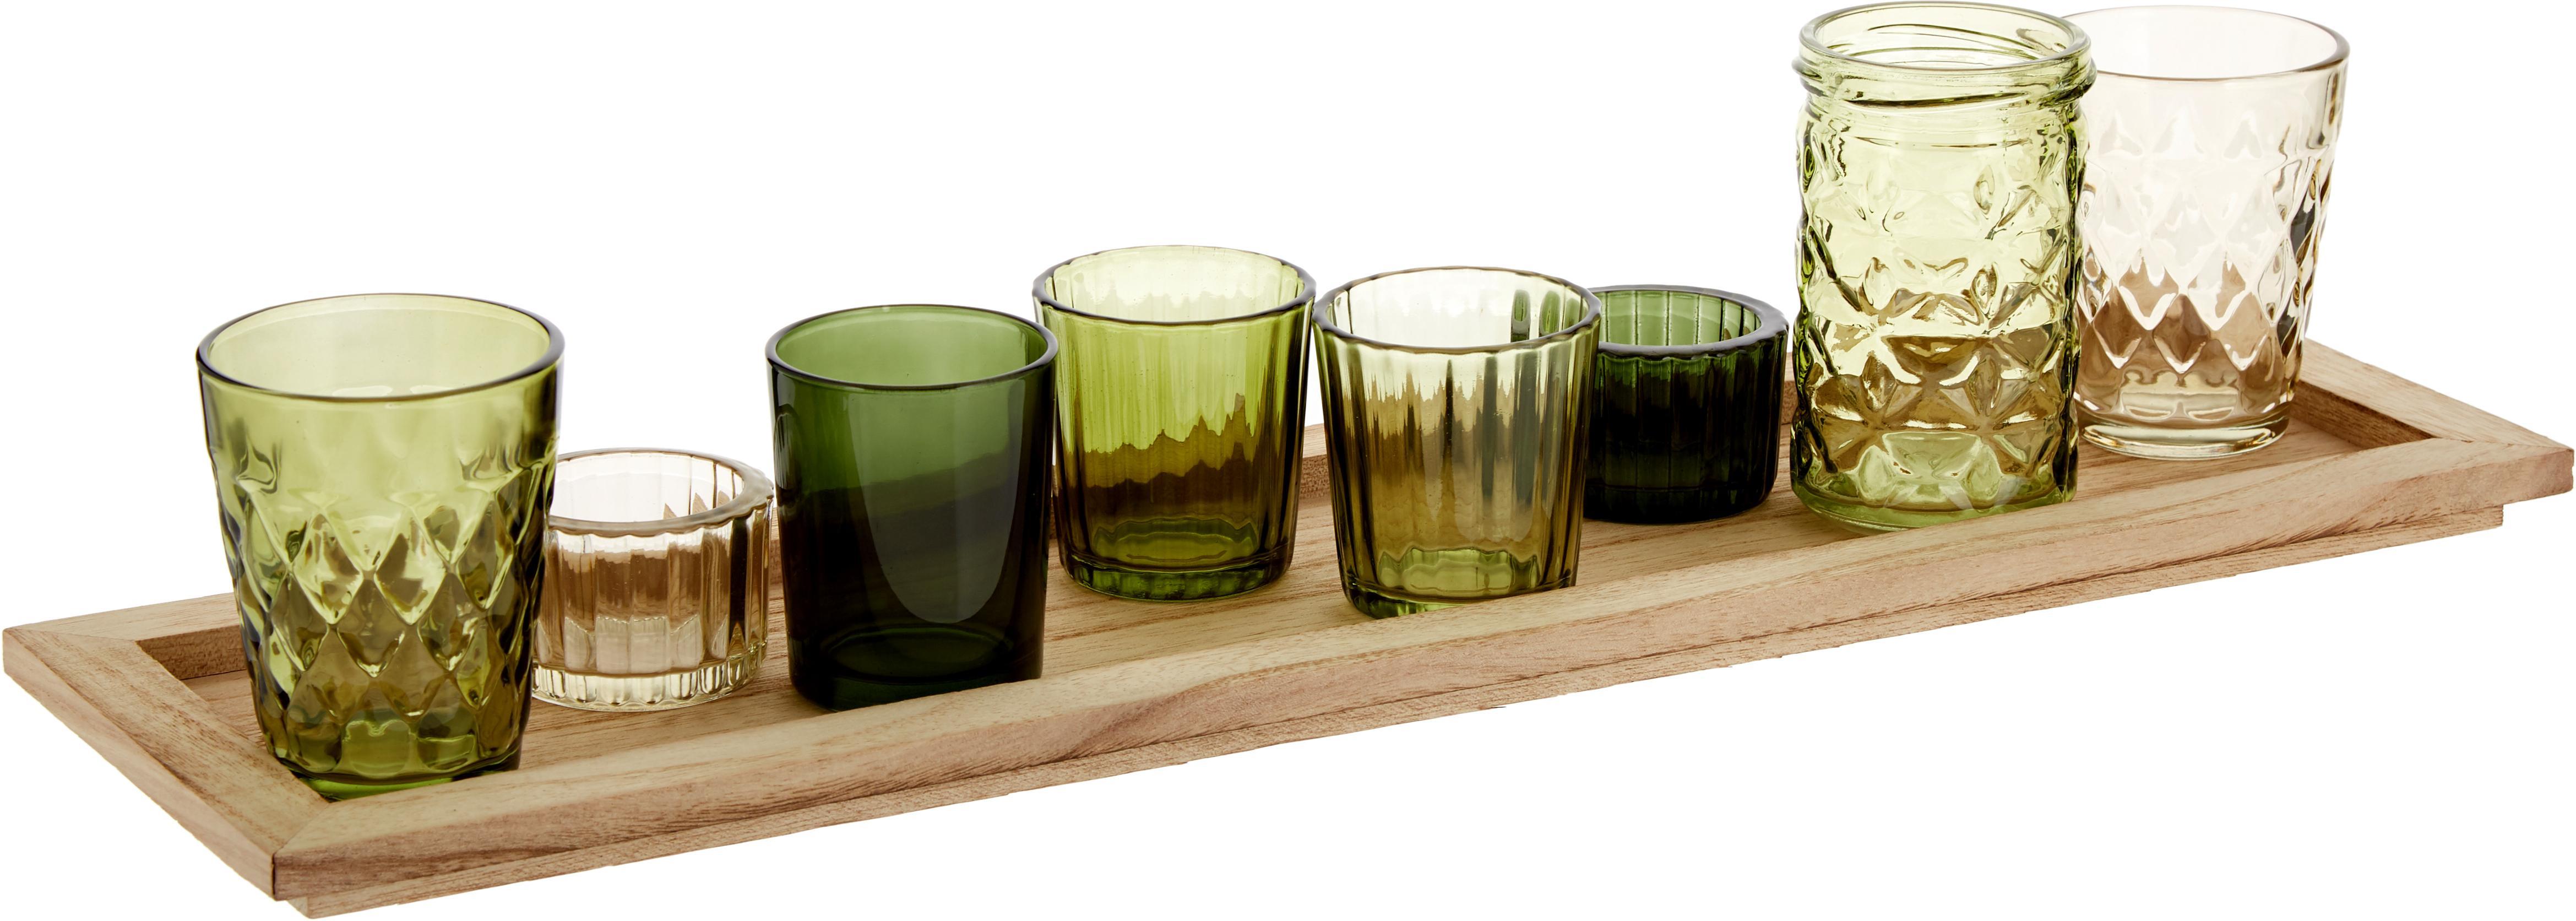 Teelichthalter-Set Wibke, 9-tlg., Tablett: Paulowniaholz, Grüntöne, Hellbraun, 50 x 11 cm